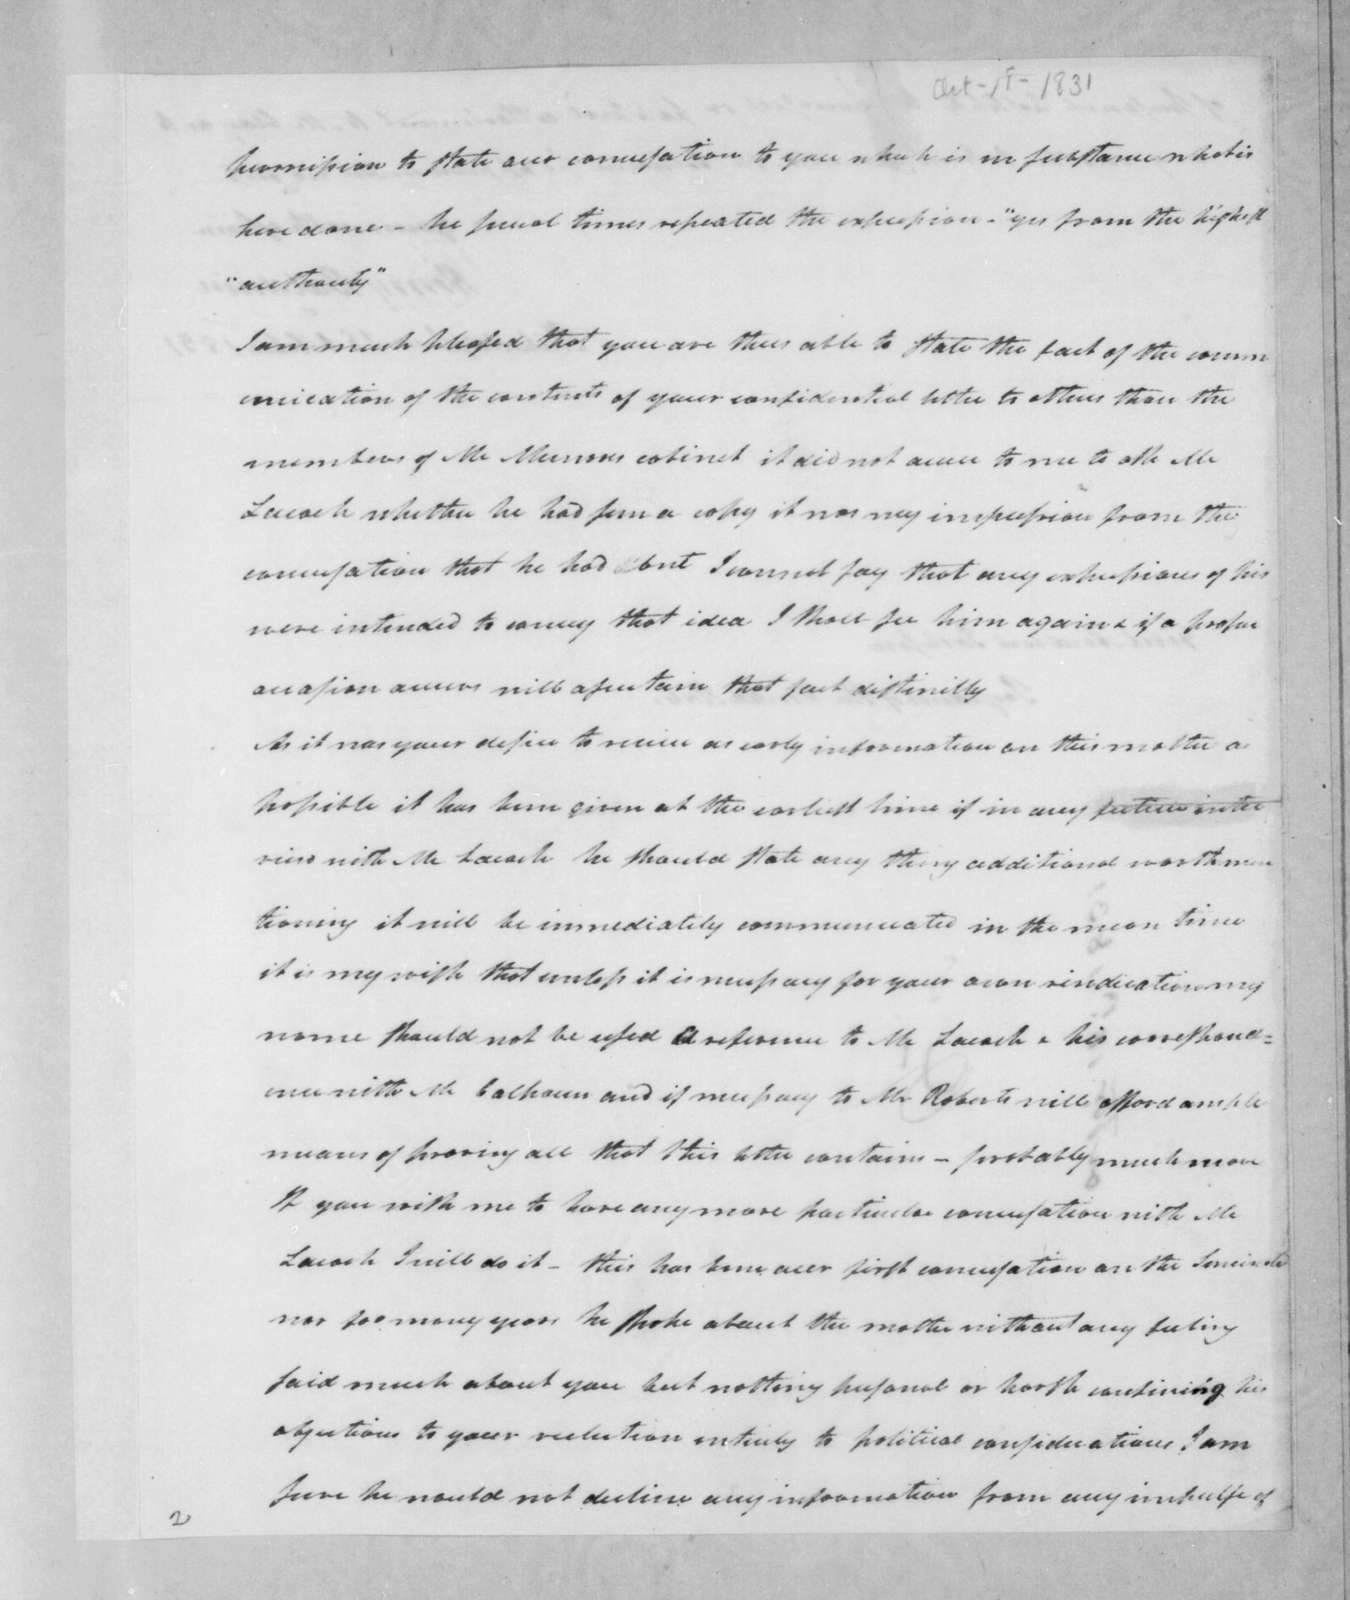 Henry Baldwin to Andrew Jackson, October 18, 1831